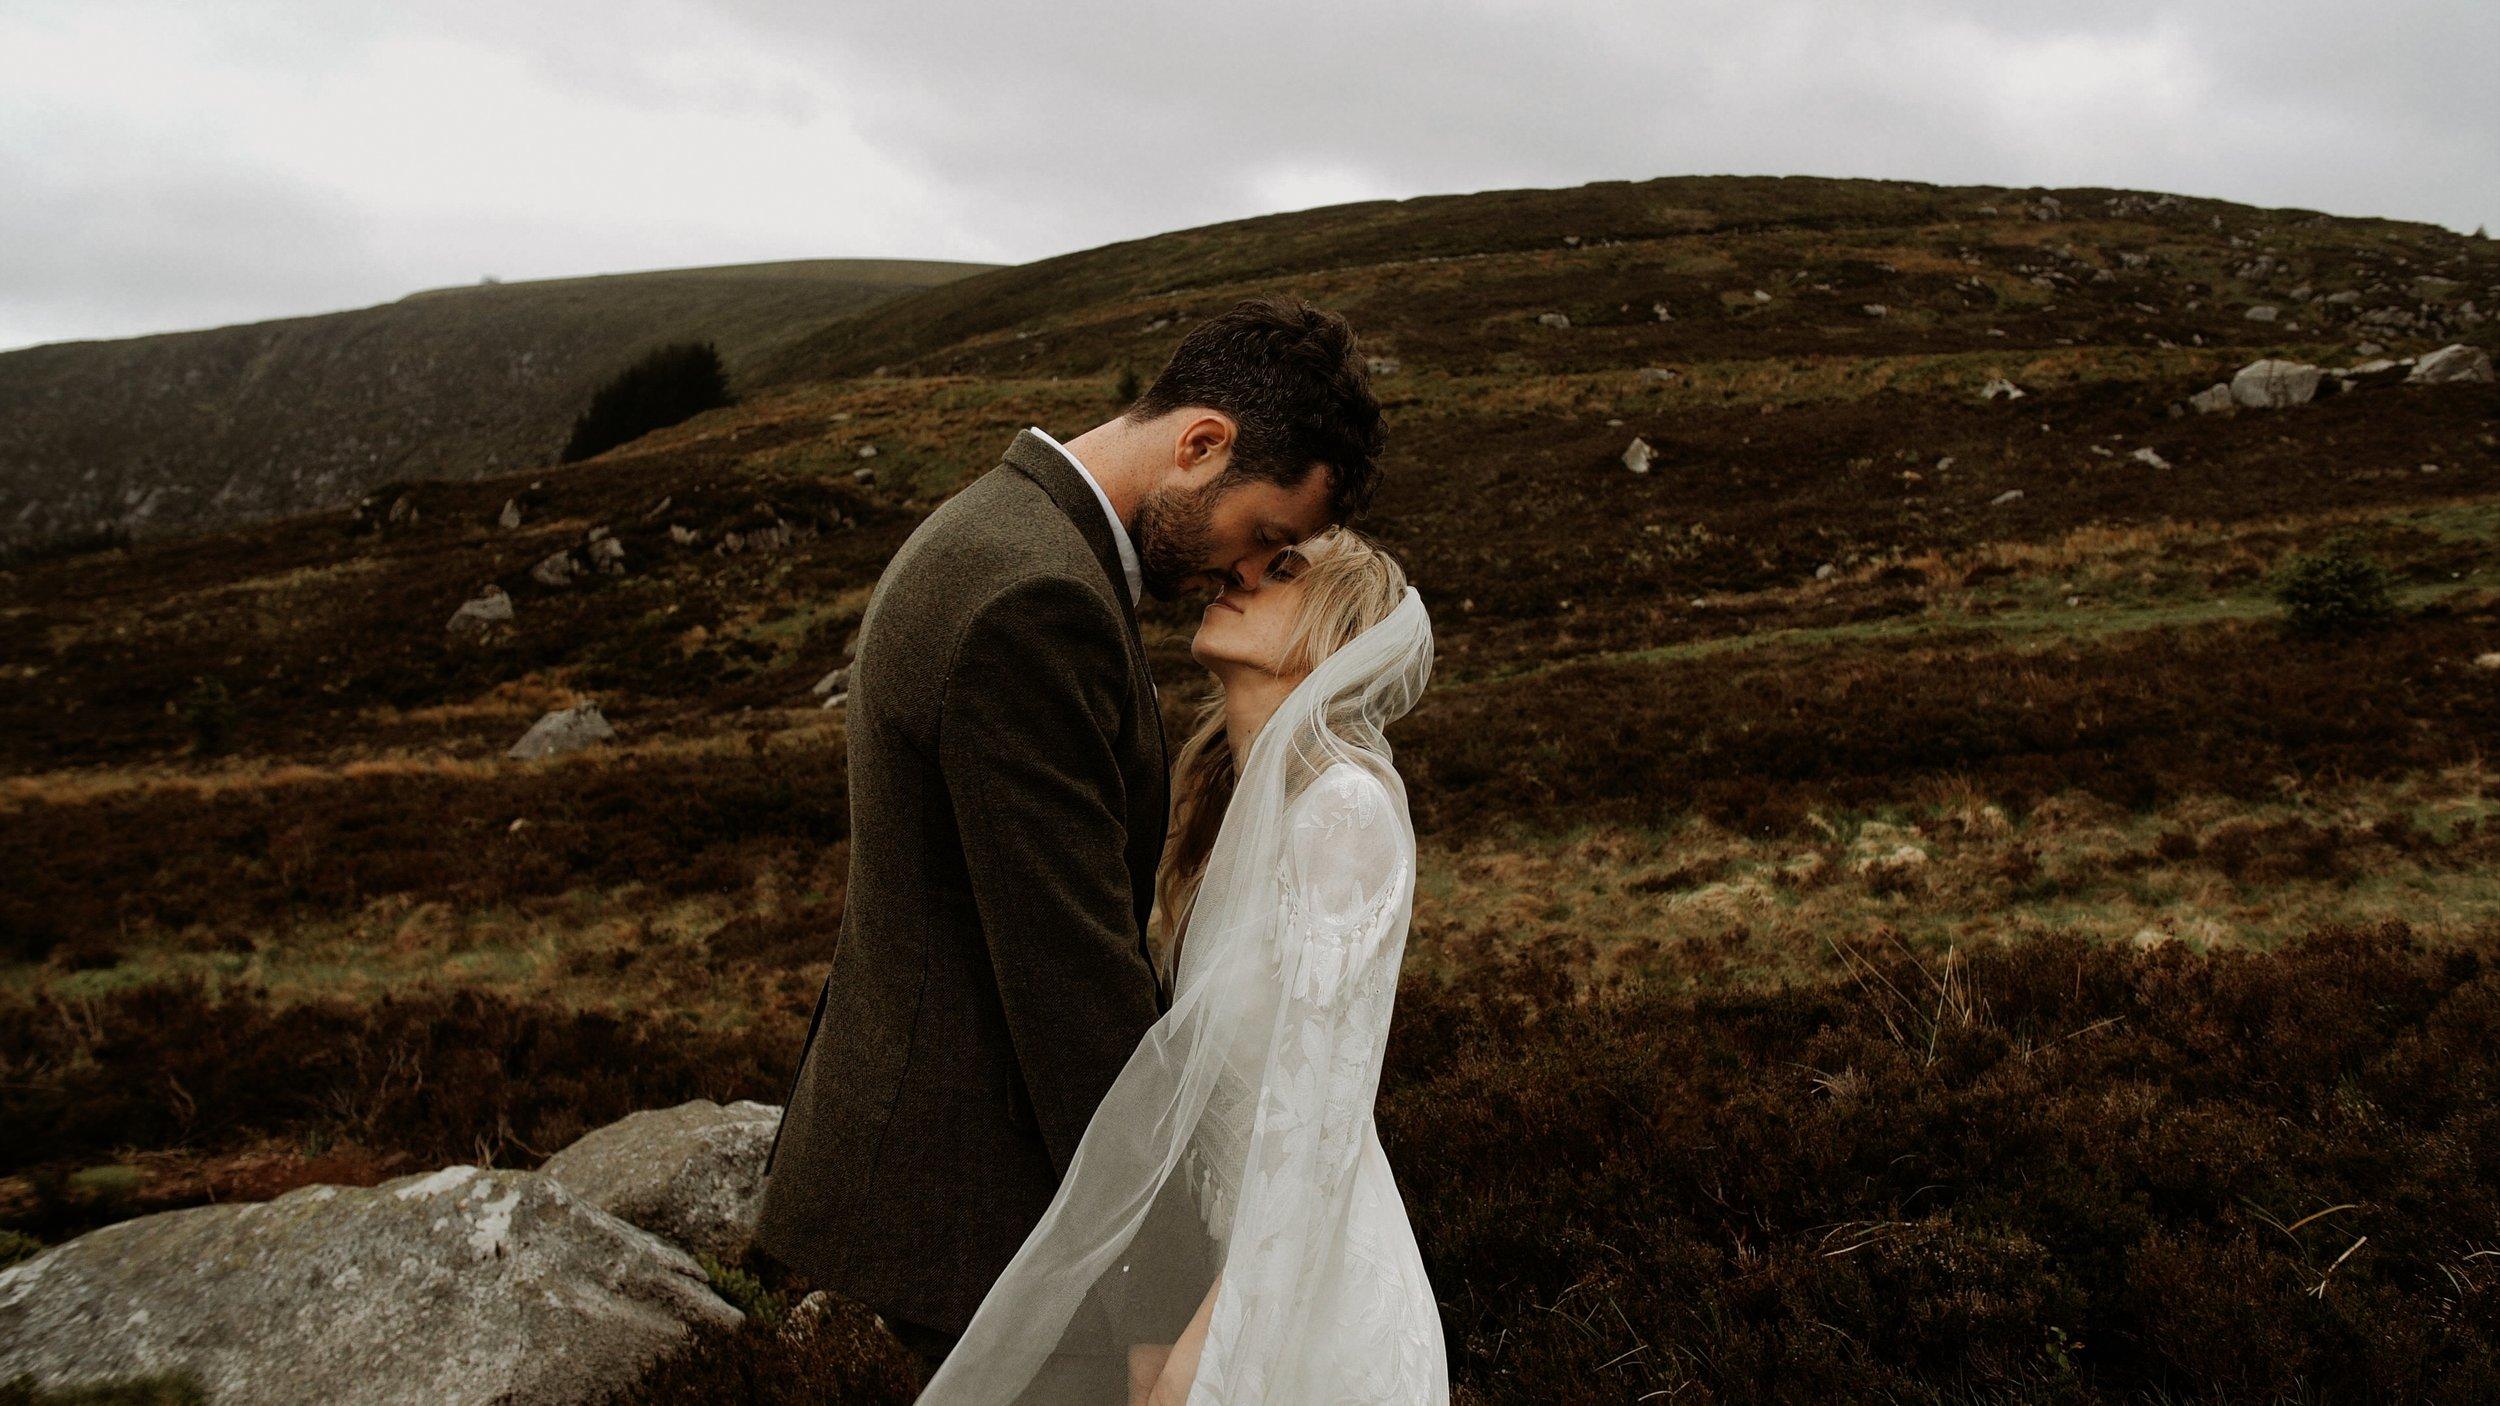 A Dreamy Intimate Ireland Garden Wedding at Burtown House and Gardens in Athy, Co. Kildare, Ireland KellyPosterFrame 00.jpg